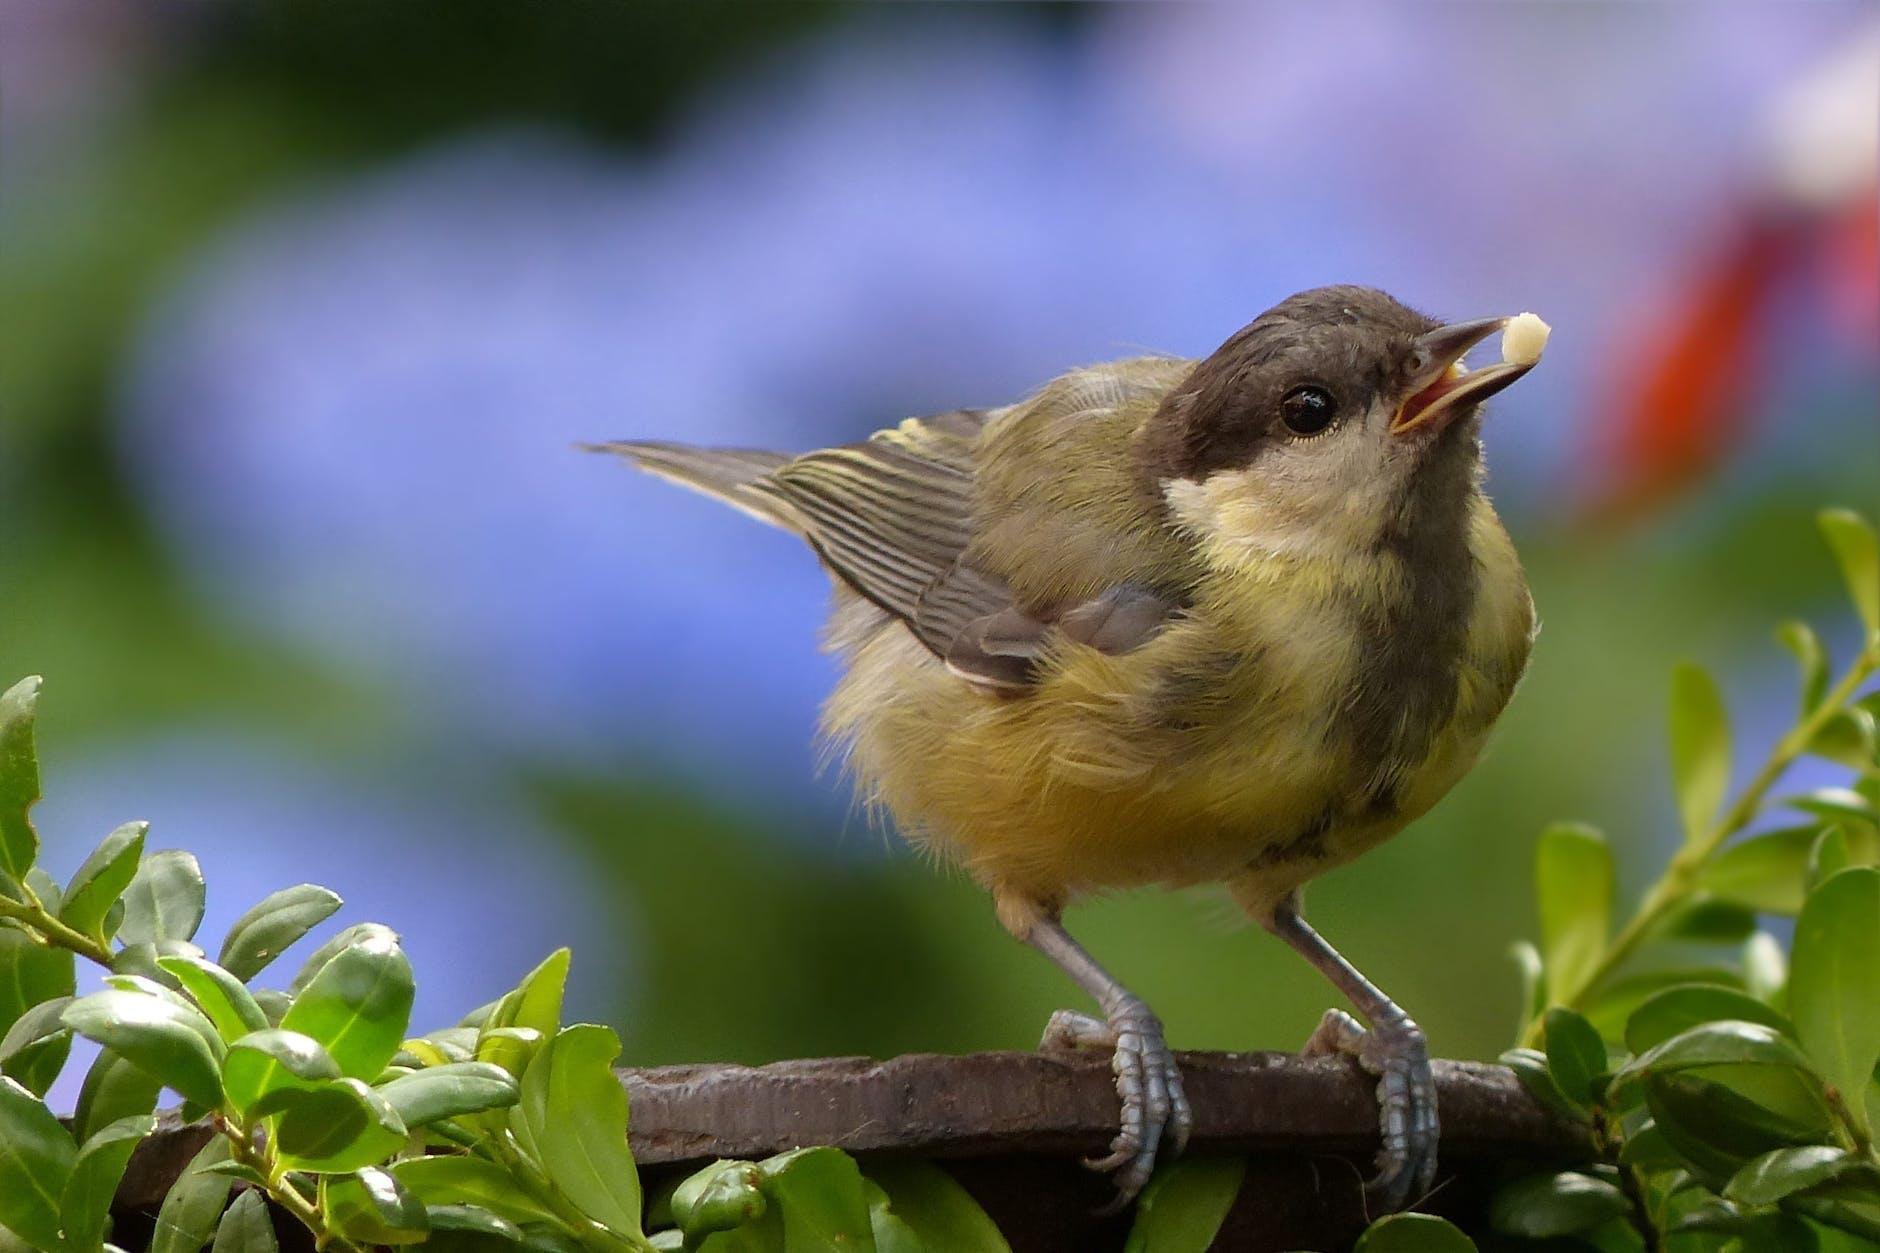 What do birds eat?